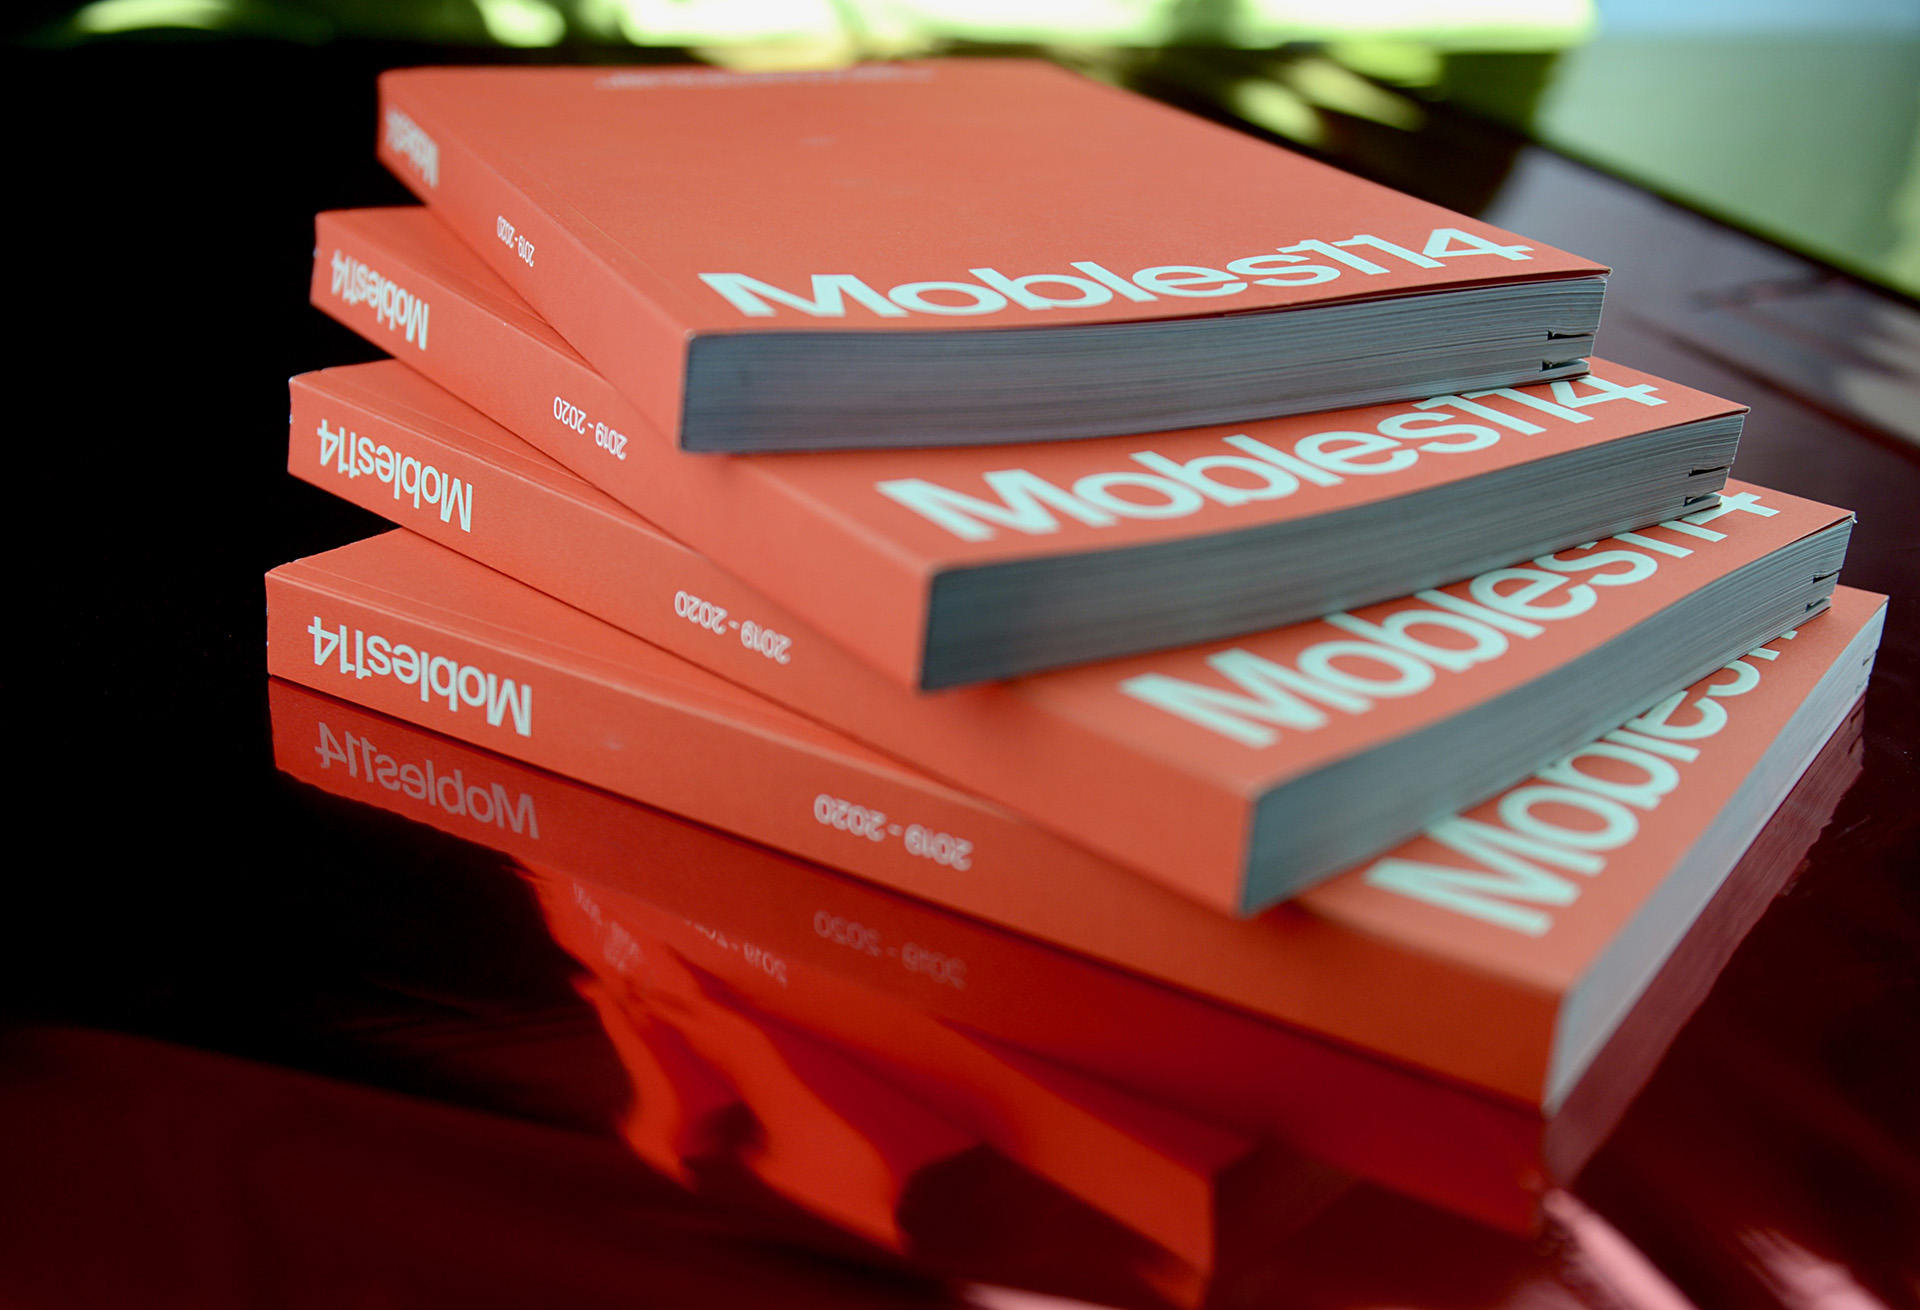 Catálogo encuadernado en rústica cosida para Mobles 114